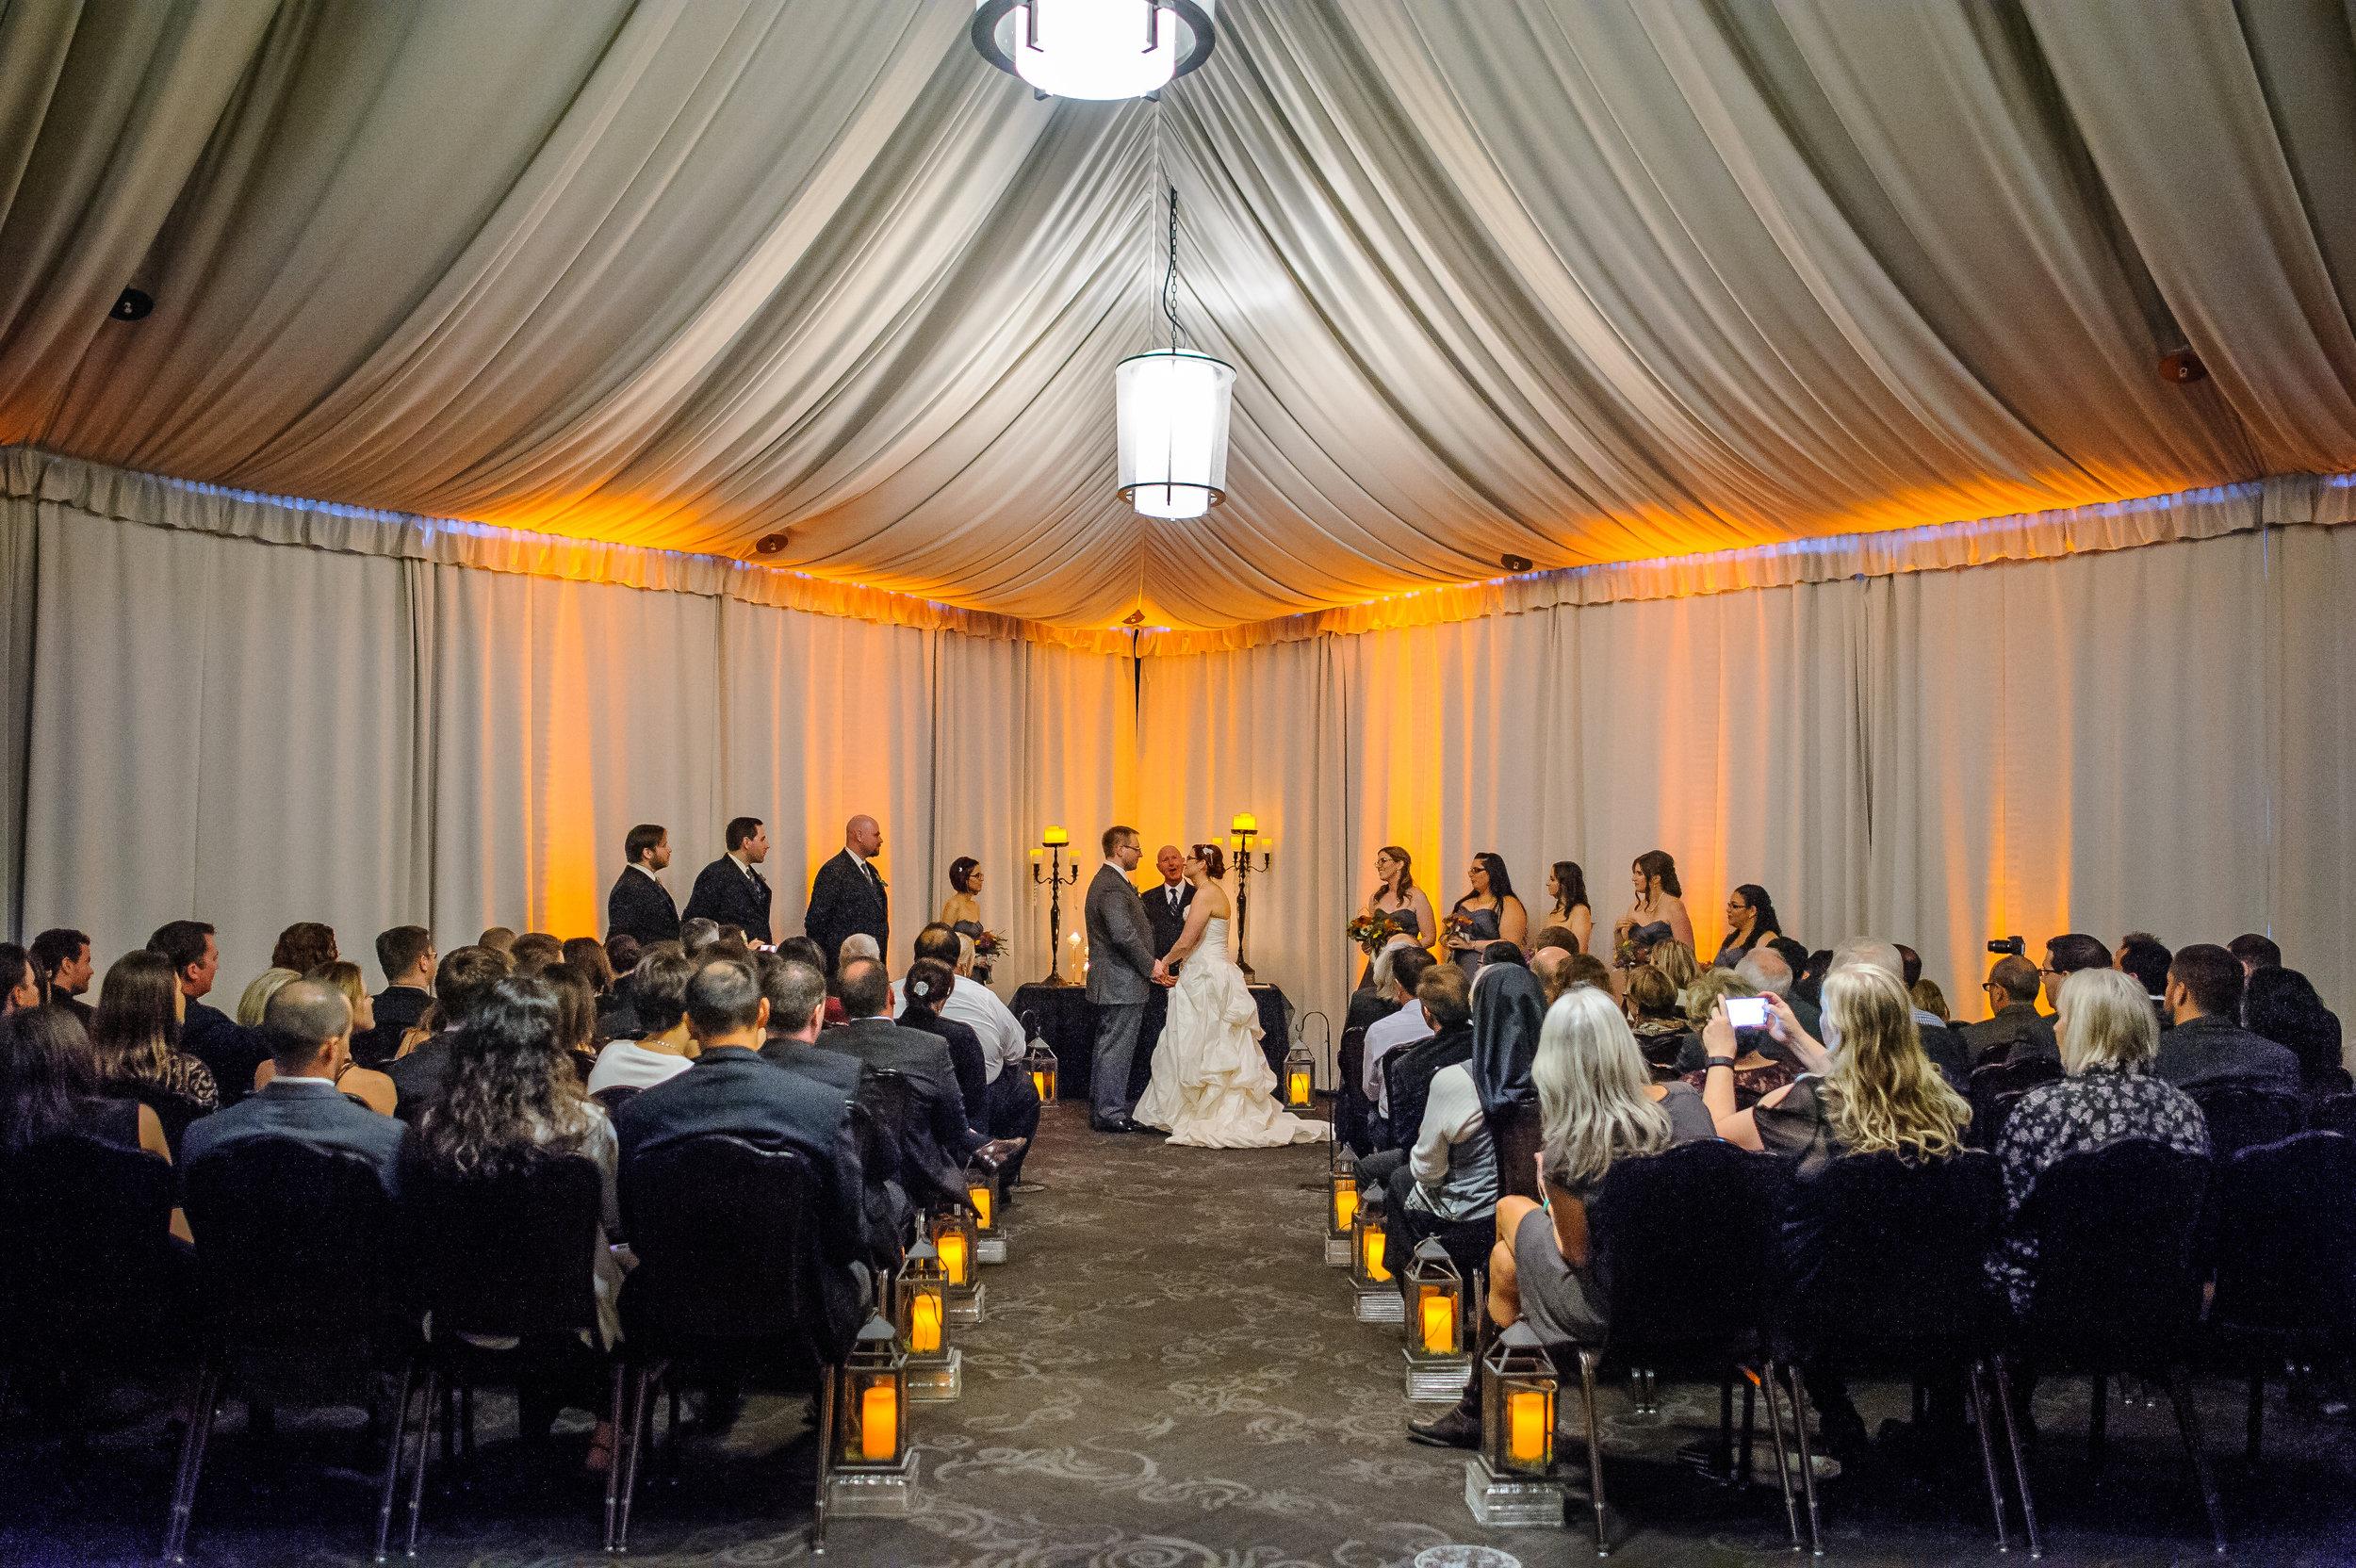 judith-john-021-citizen-hotel-sacramento-wedding-photographer-katherine-nicole-photography.JPG